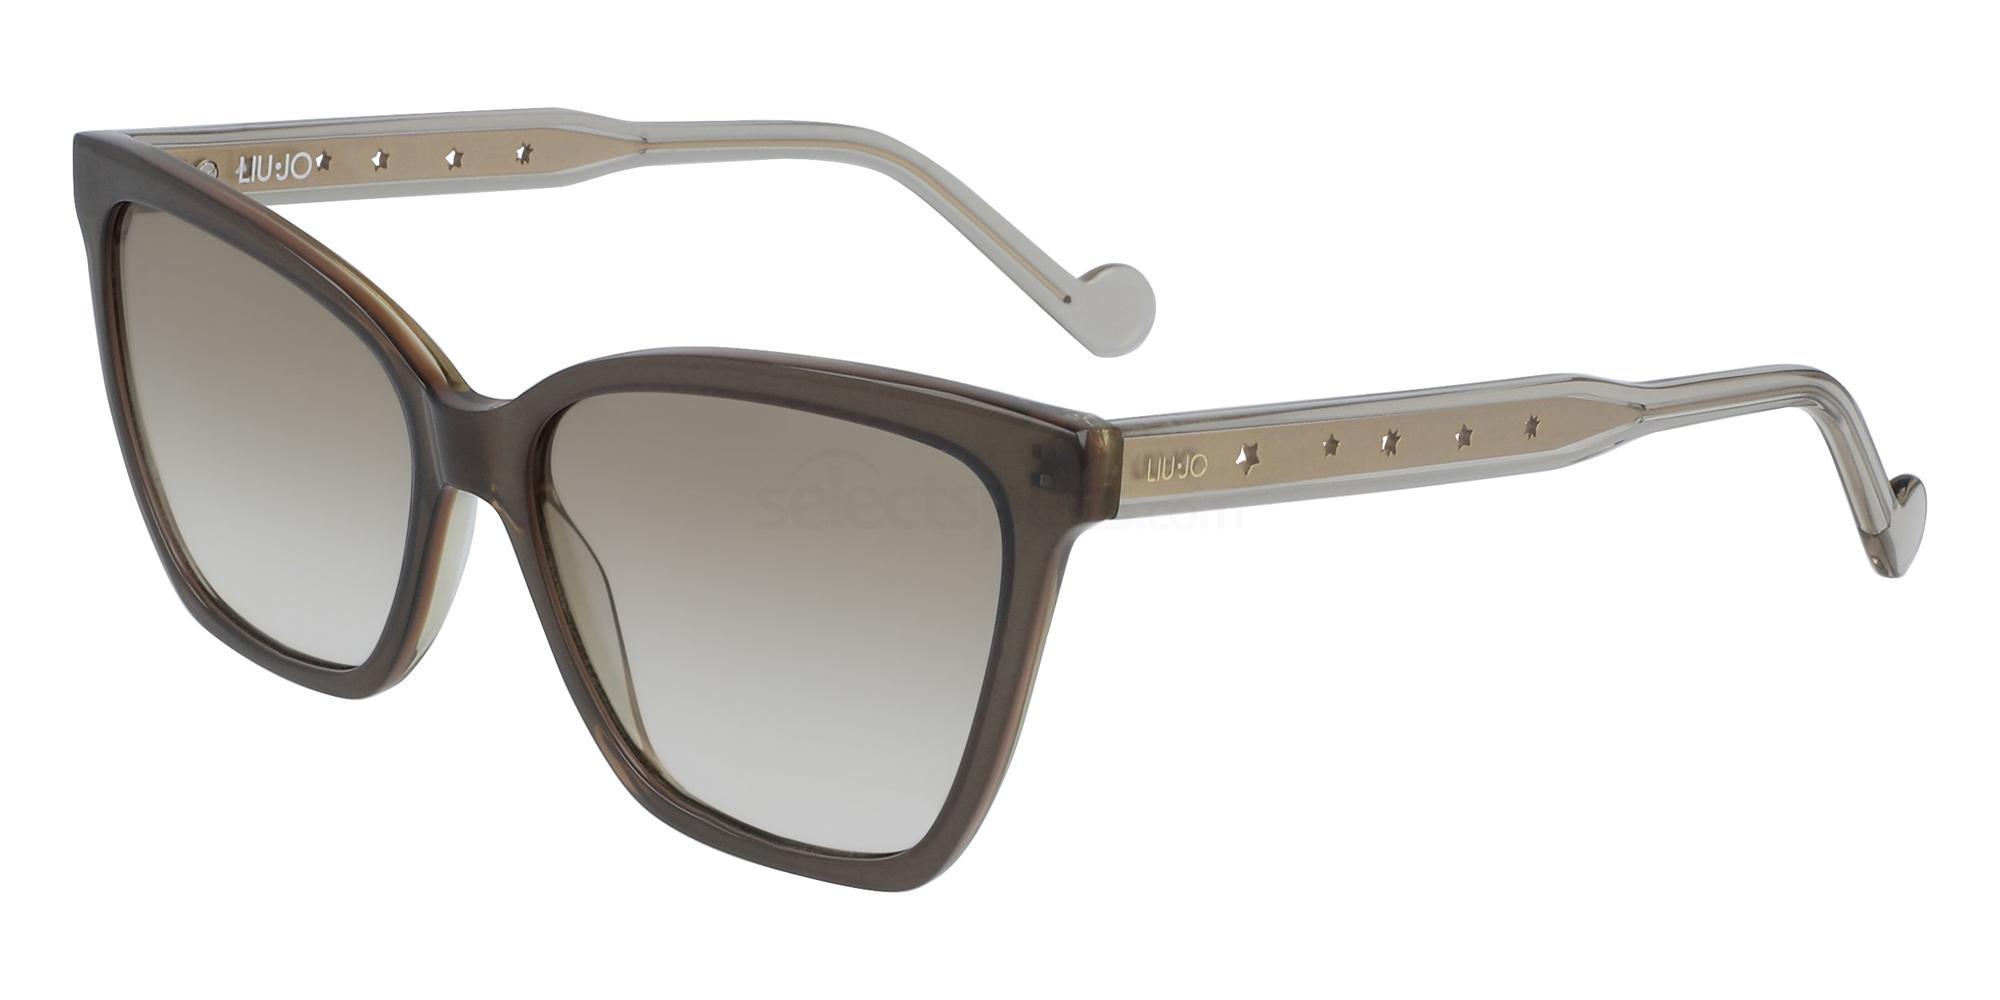 064 LJ727S Sunglasses, Liu Jo